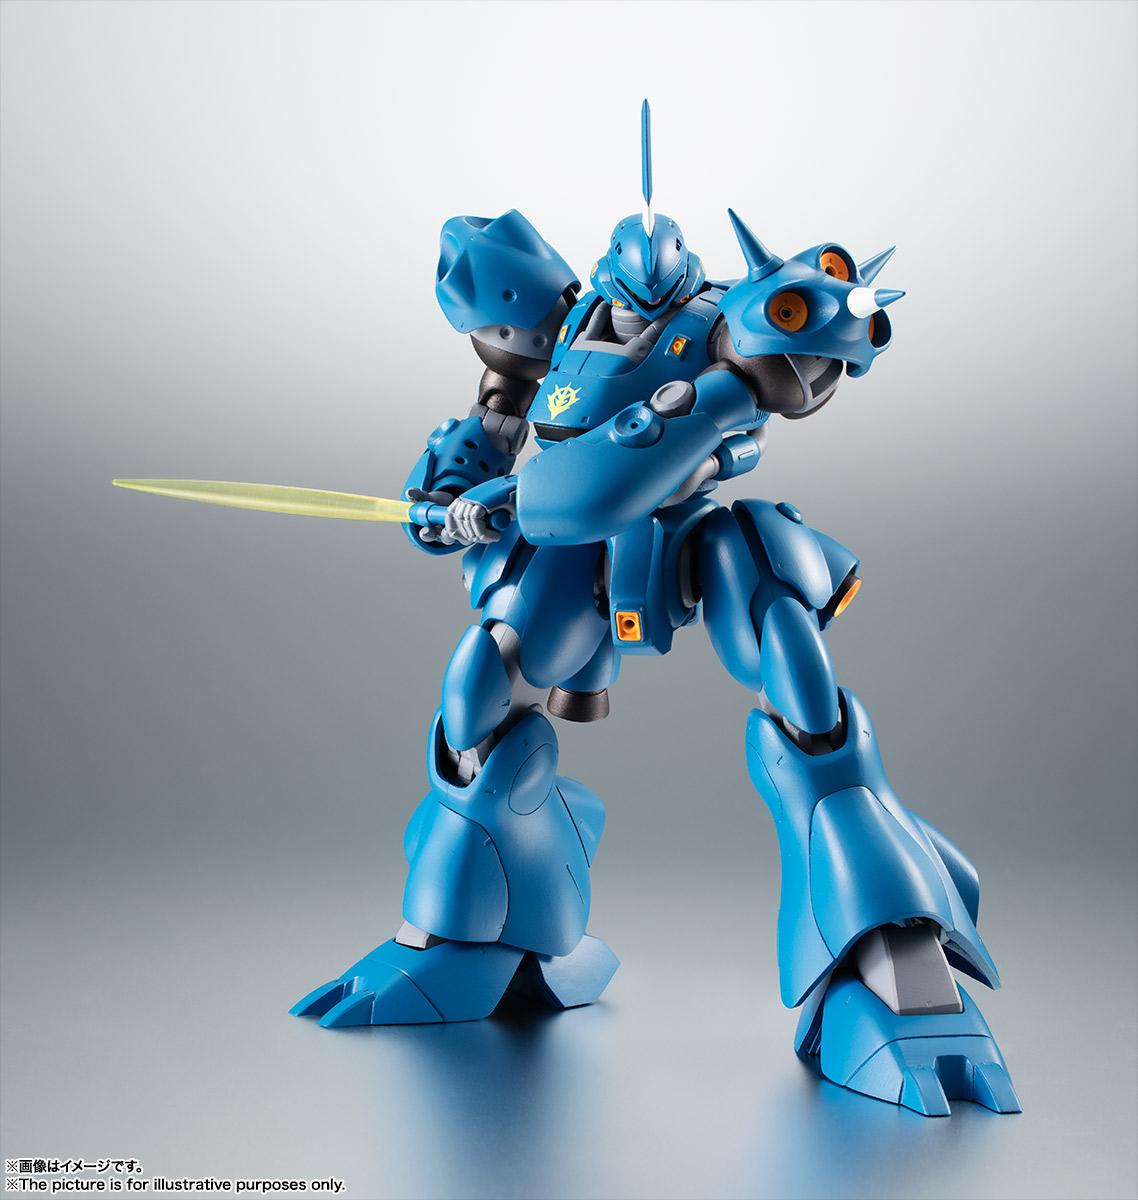 ROBOT魂〈SIDE MS〉『MS-18E ケンプファー ver. A.N.I.M.E.』機動戦士ガンダム0080 ポケットの中の戦争 可動フィギュア-003